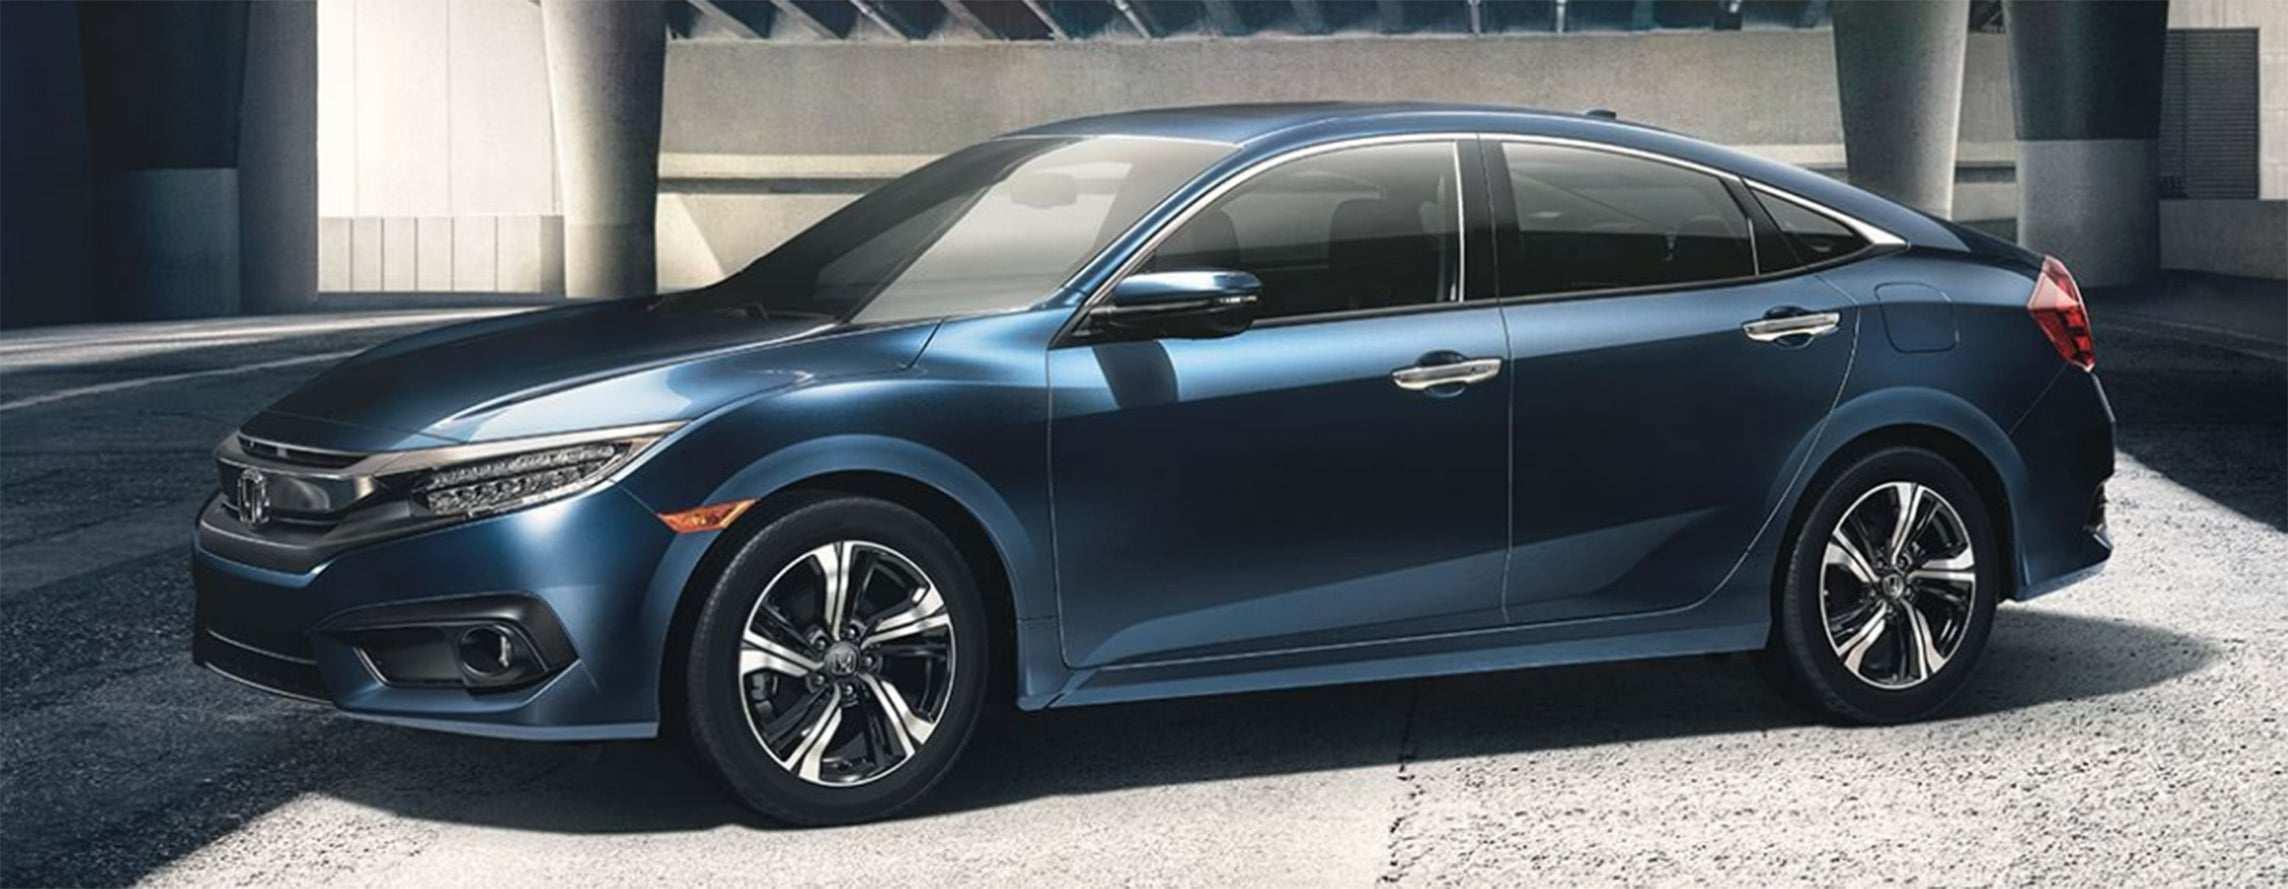 61 Concept of Honda Civic 2020 Price In Pakistan Price and Review with Honda Civic 2020 Price In Pakistan